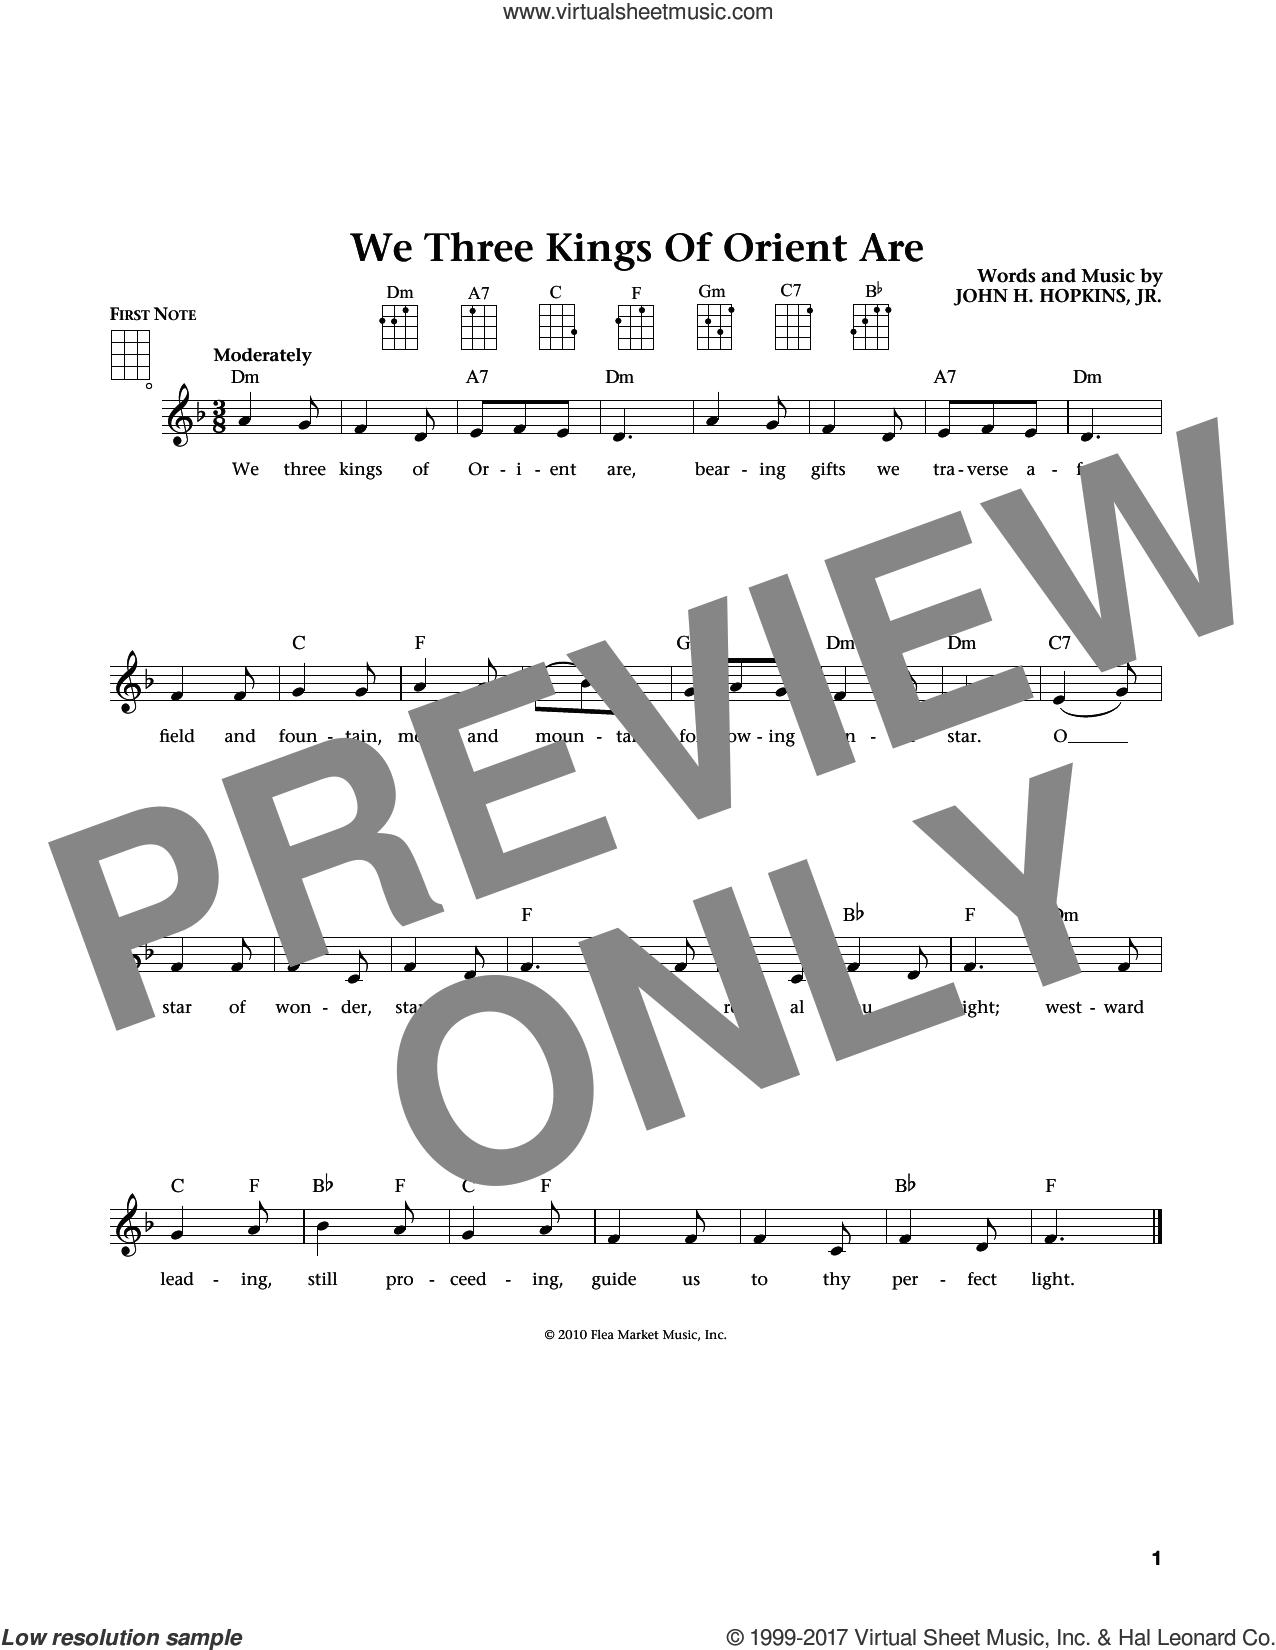 We Three Kings Of Orient Are (from The Daily Ukulele) (arr. Liz and Jim Beloff) sheet music for ukulele by John H. Hopkins, Jr., Jim Beloff and Liz Beloff, intermediate skill level